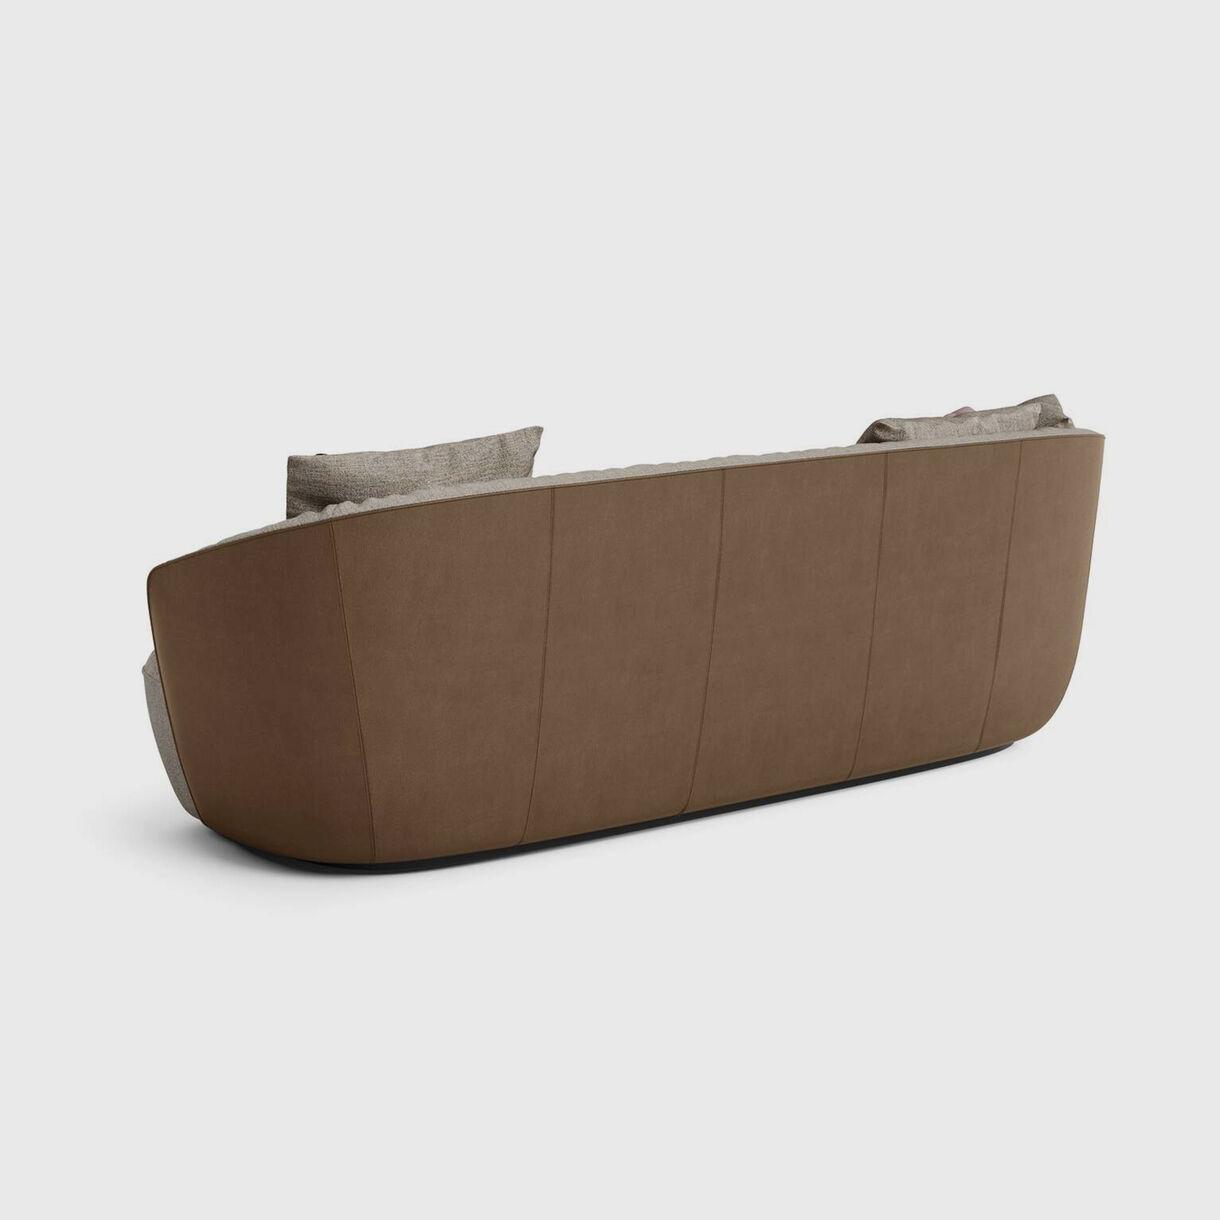 Ishino Sofa, 3 Seater